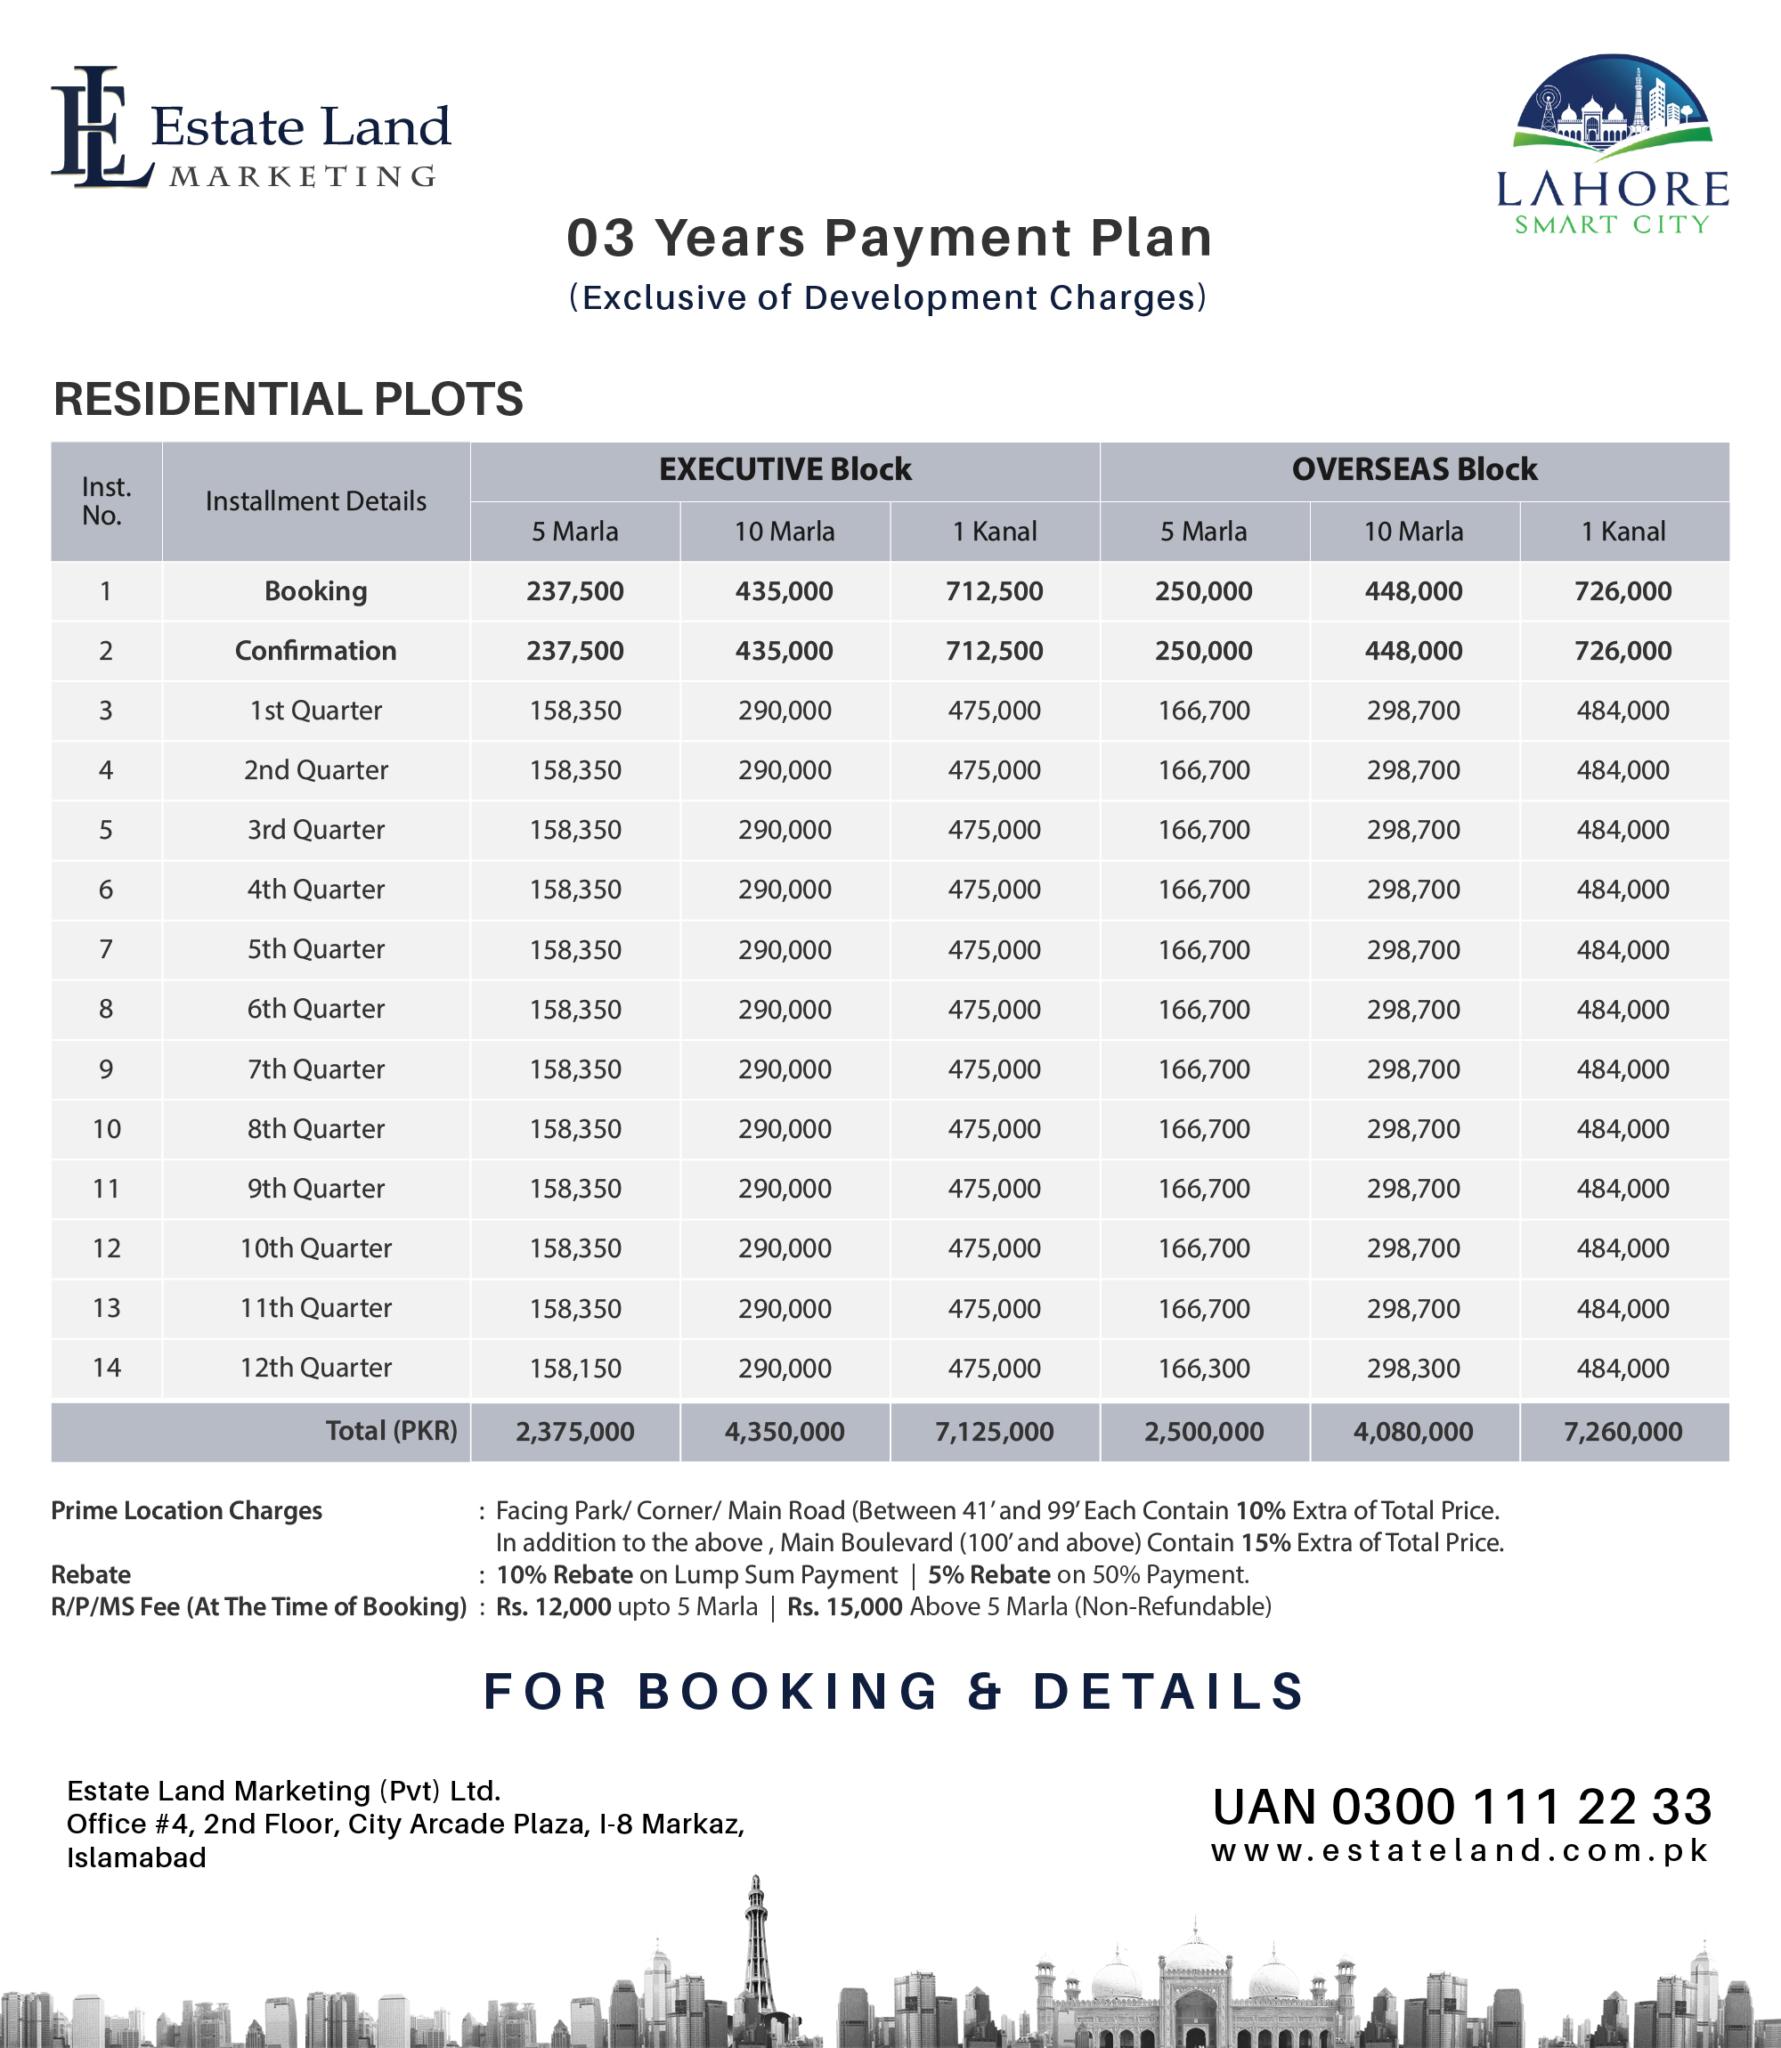 5 and 10 marla installment price plan